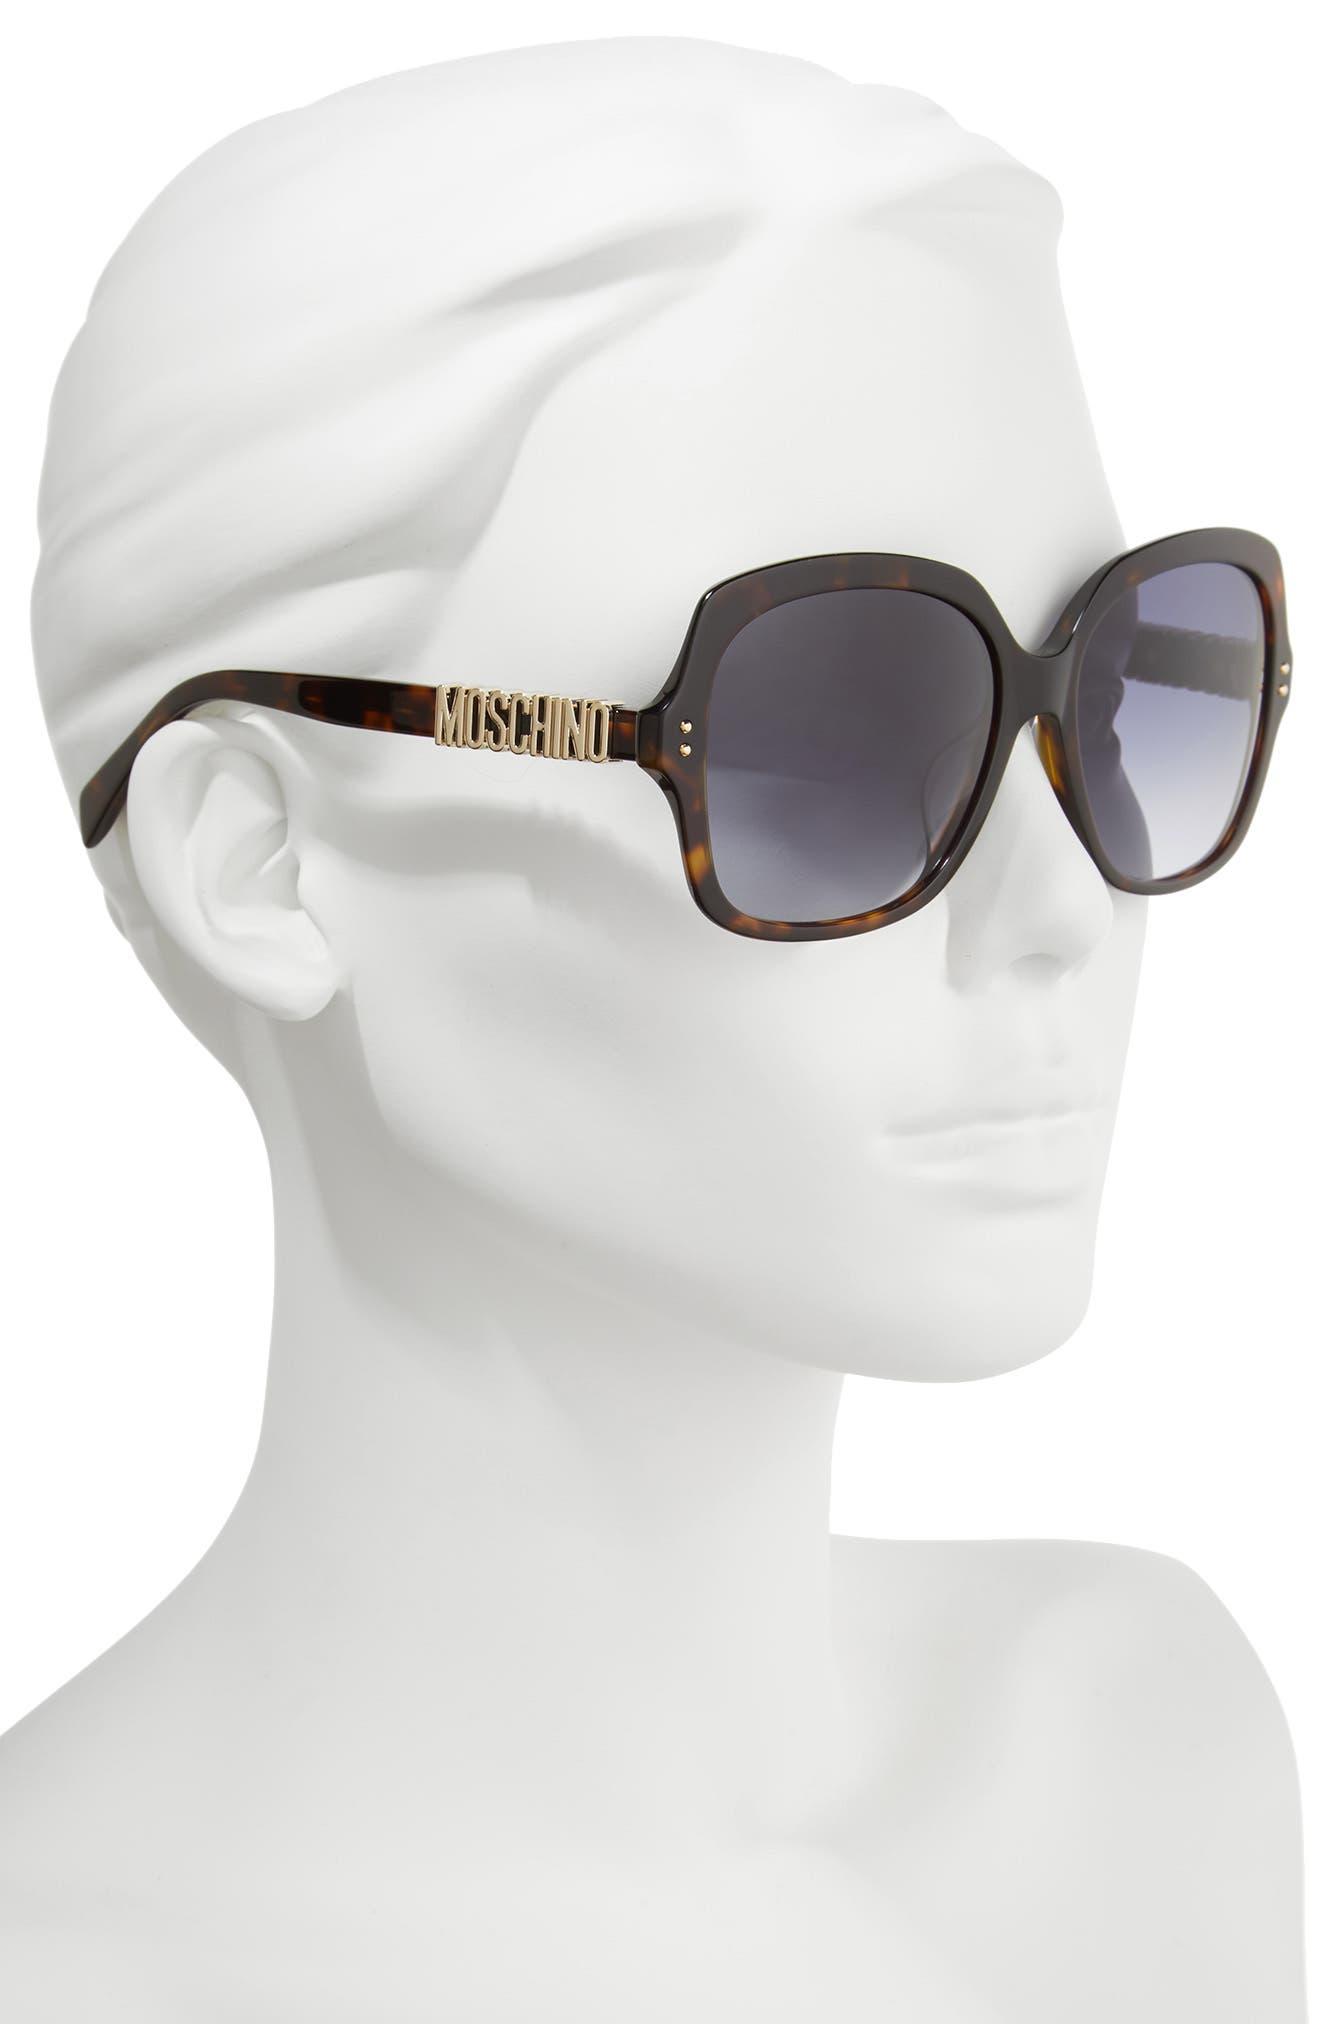 57mm Oversized Polarized Sunglasses,                             Alternate thumbnail 2, color,                             Dark Havana